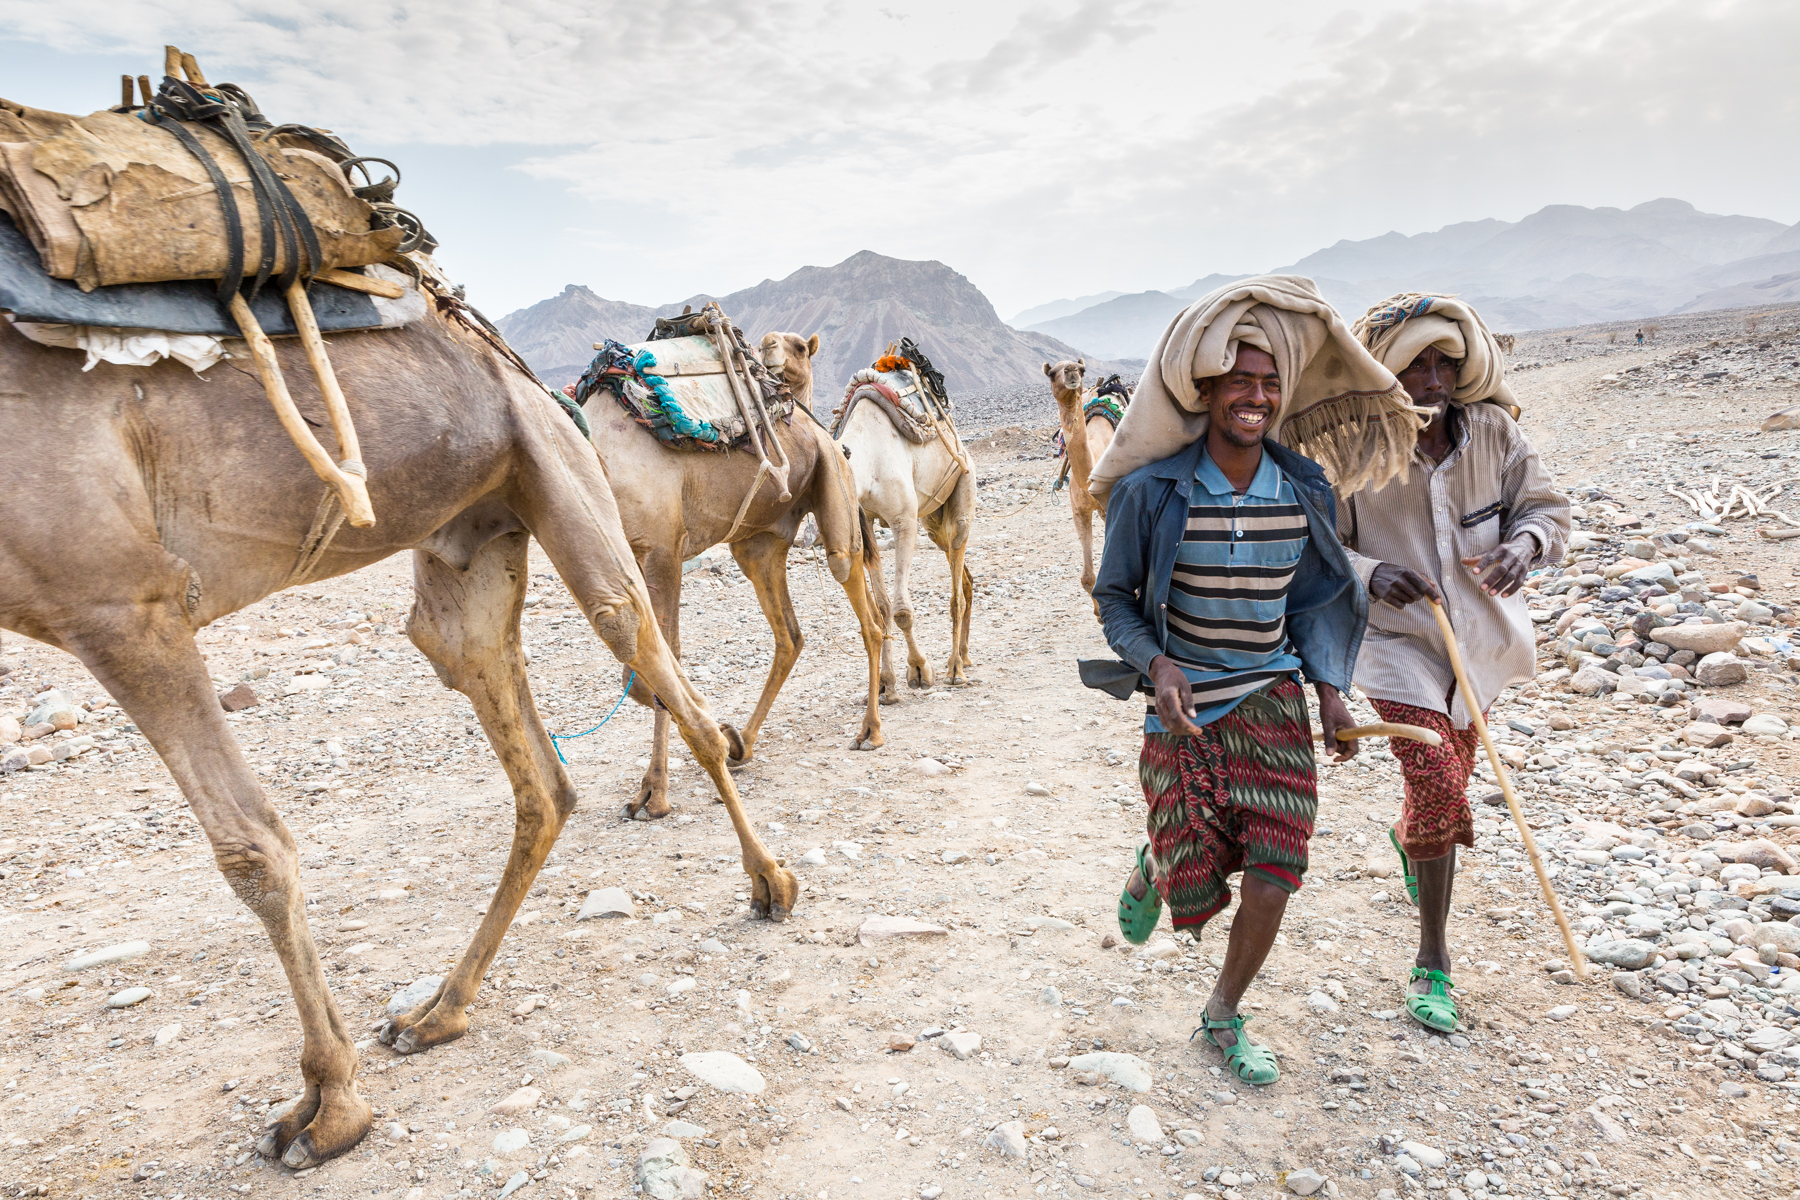 Joni_Kabana_Salt_Workers_Of_Ethiopia.jpg